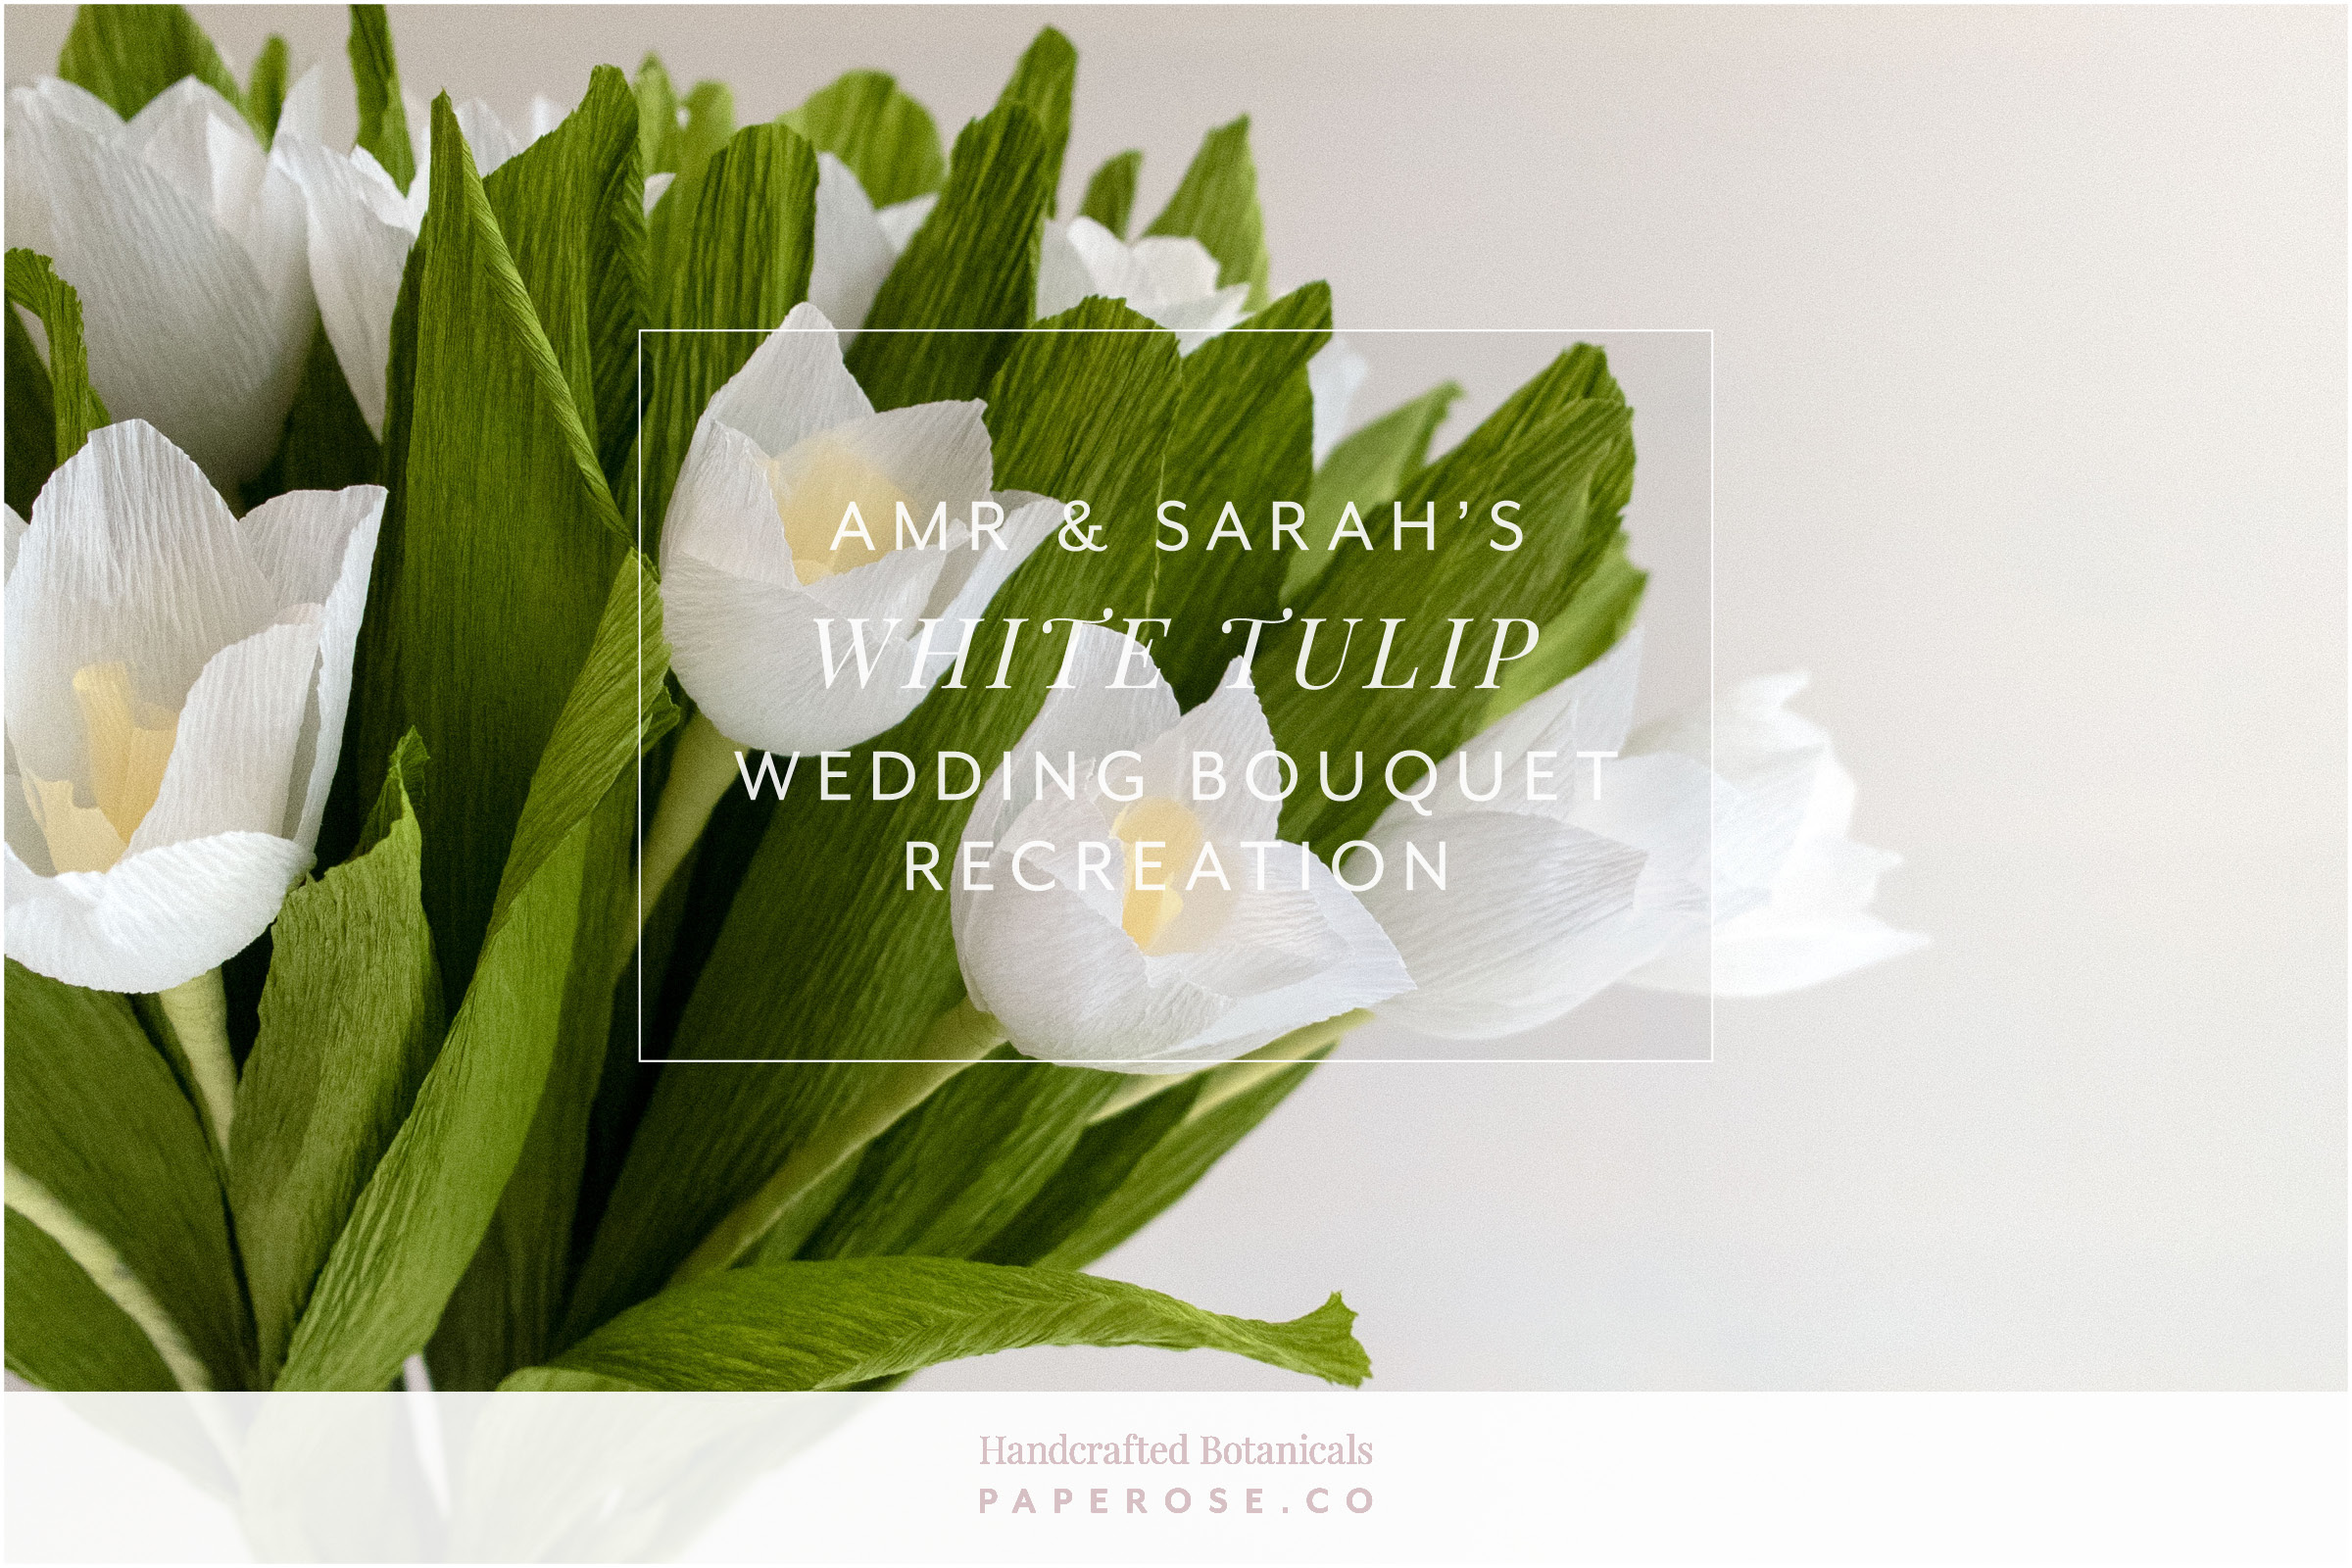 Paper Rose Co. White Tulip Wedding Bouquet Recreation